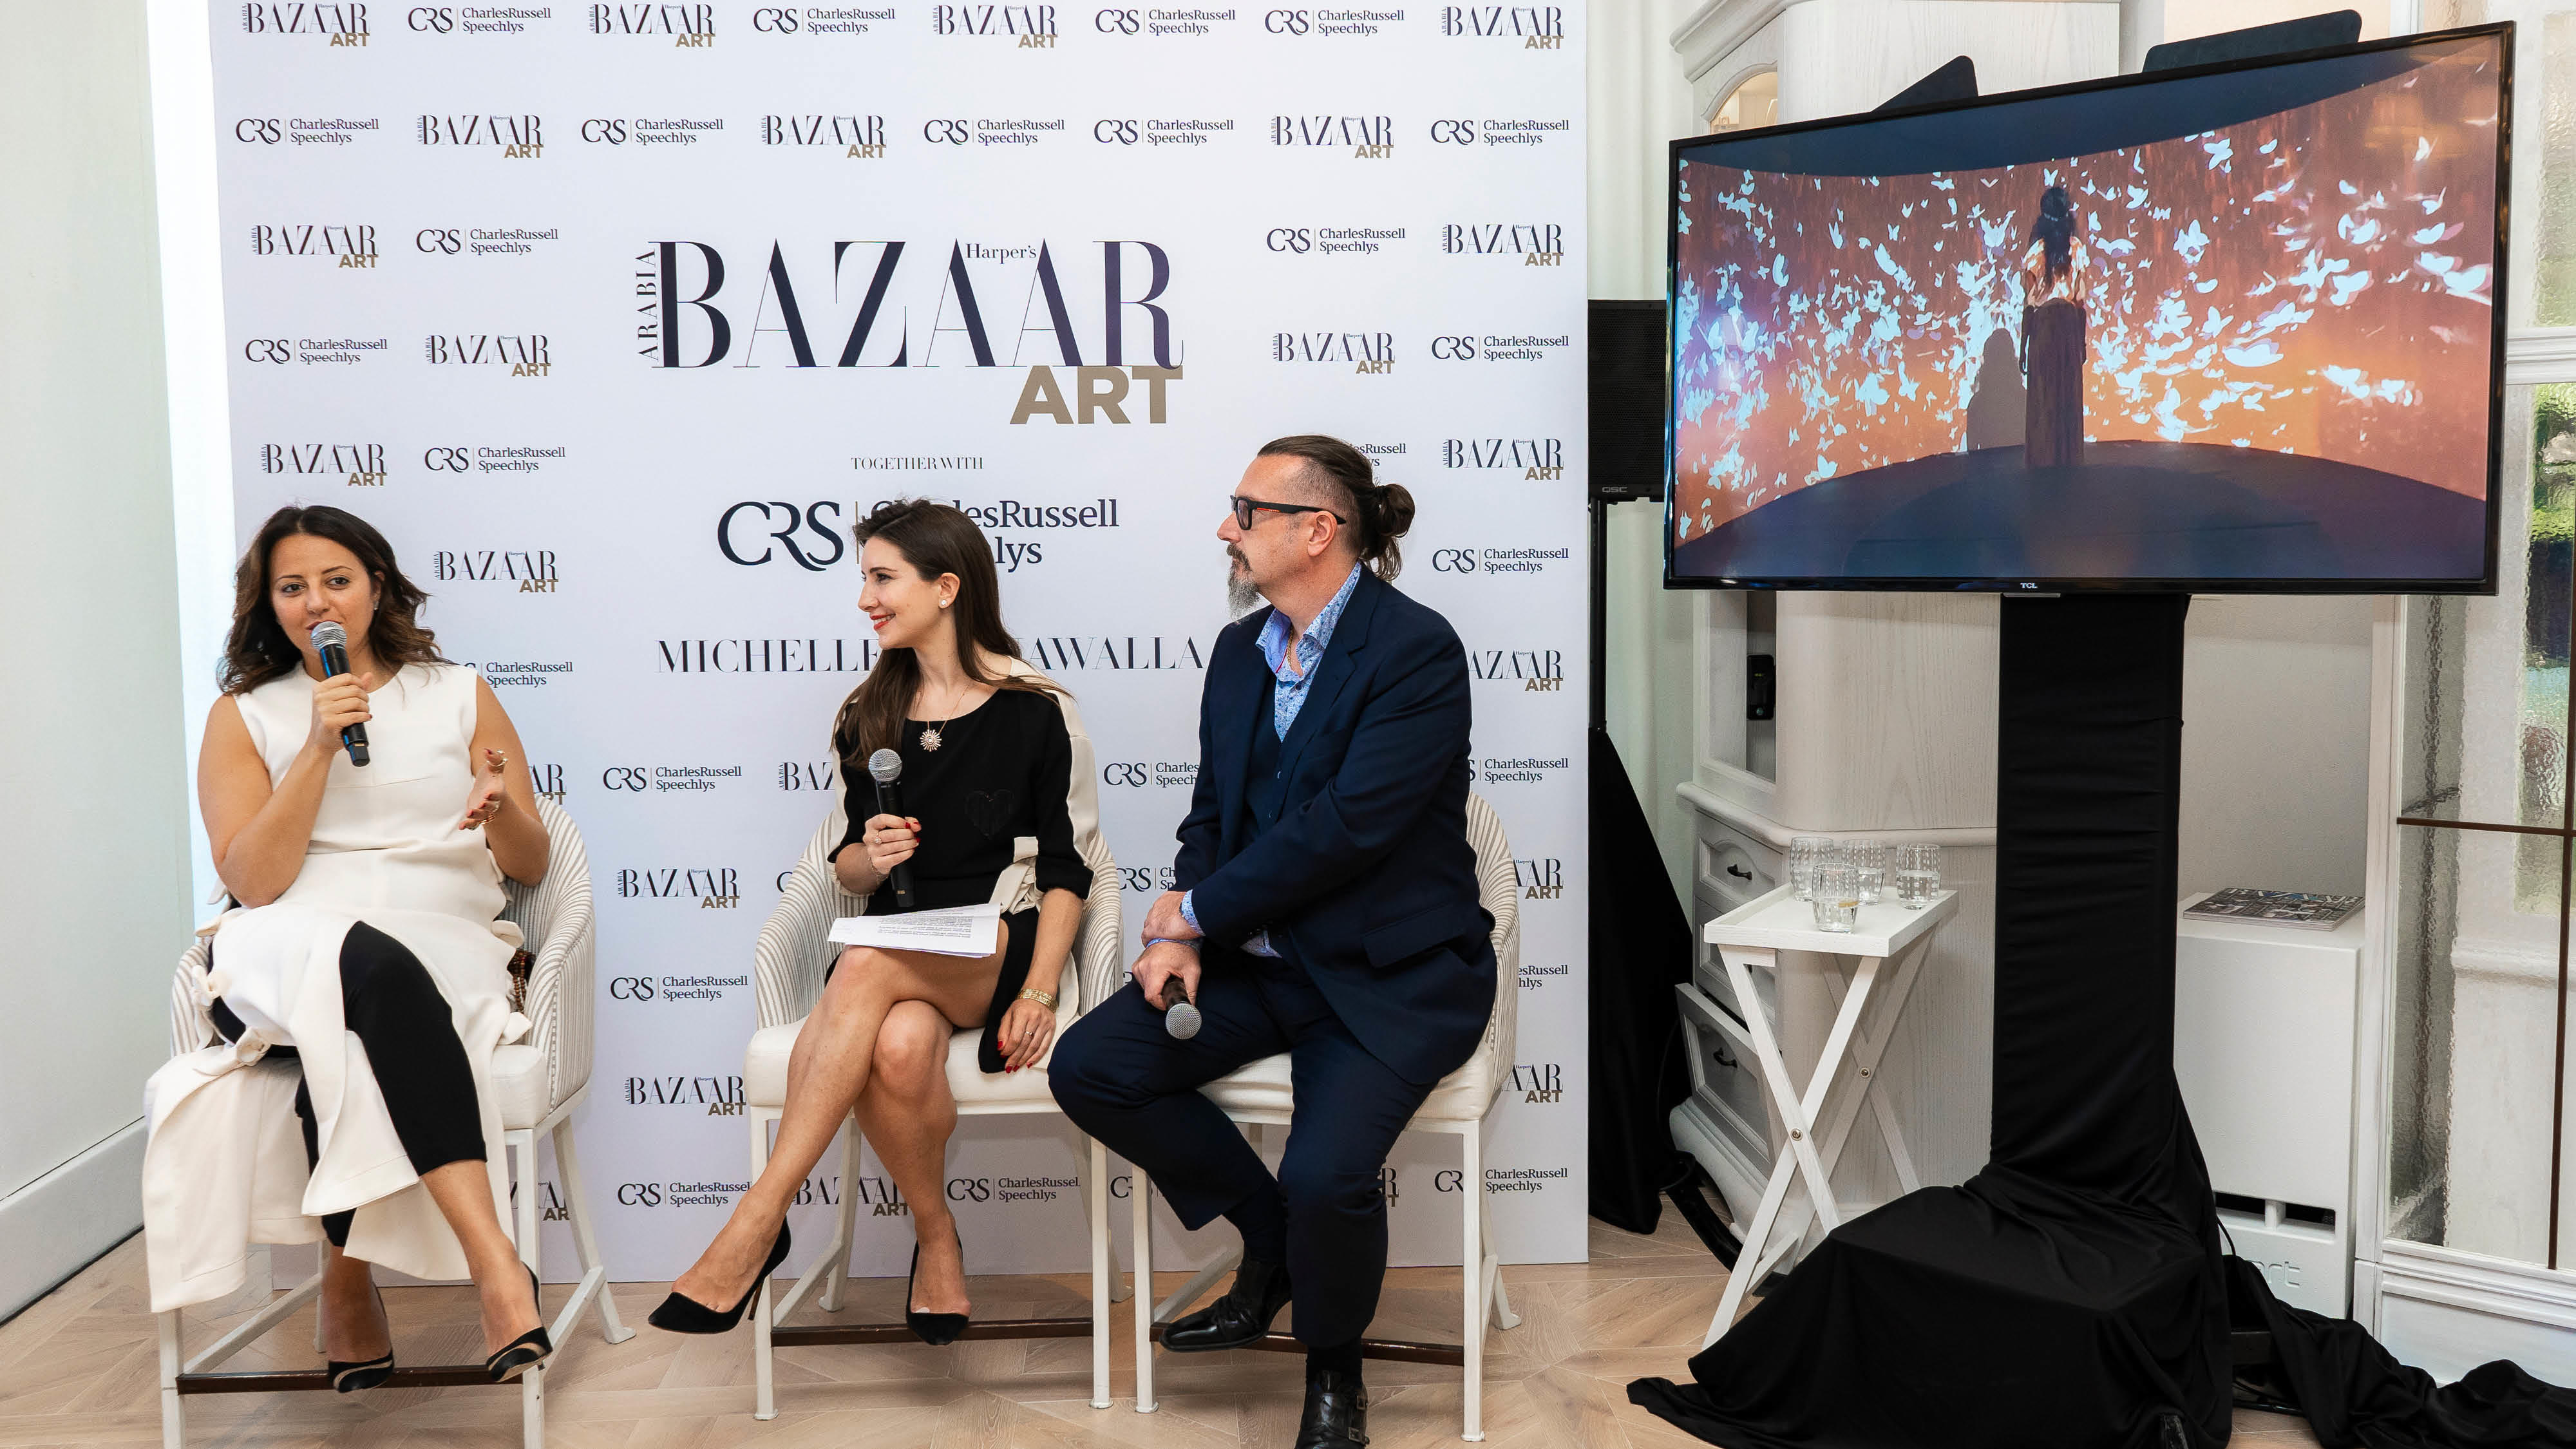 Pictures: Harper's Bazaar Art Celebrates Dubai Art Season With An Intimate Lunch